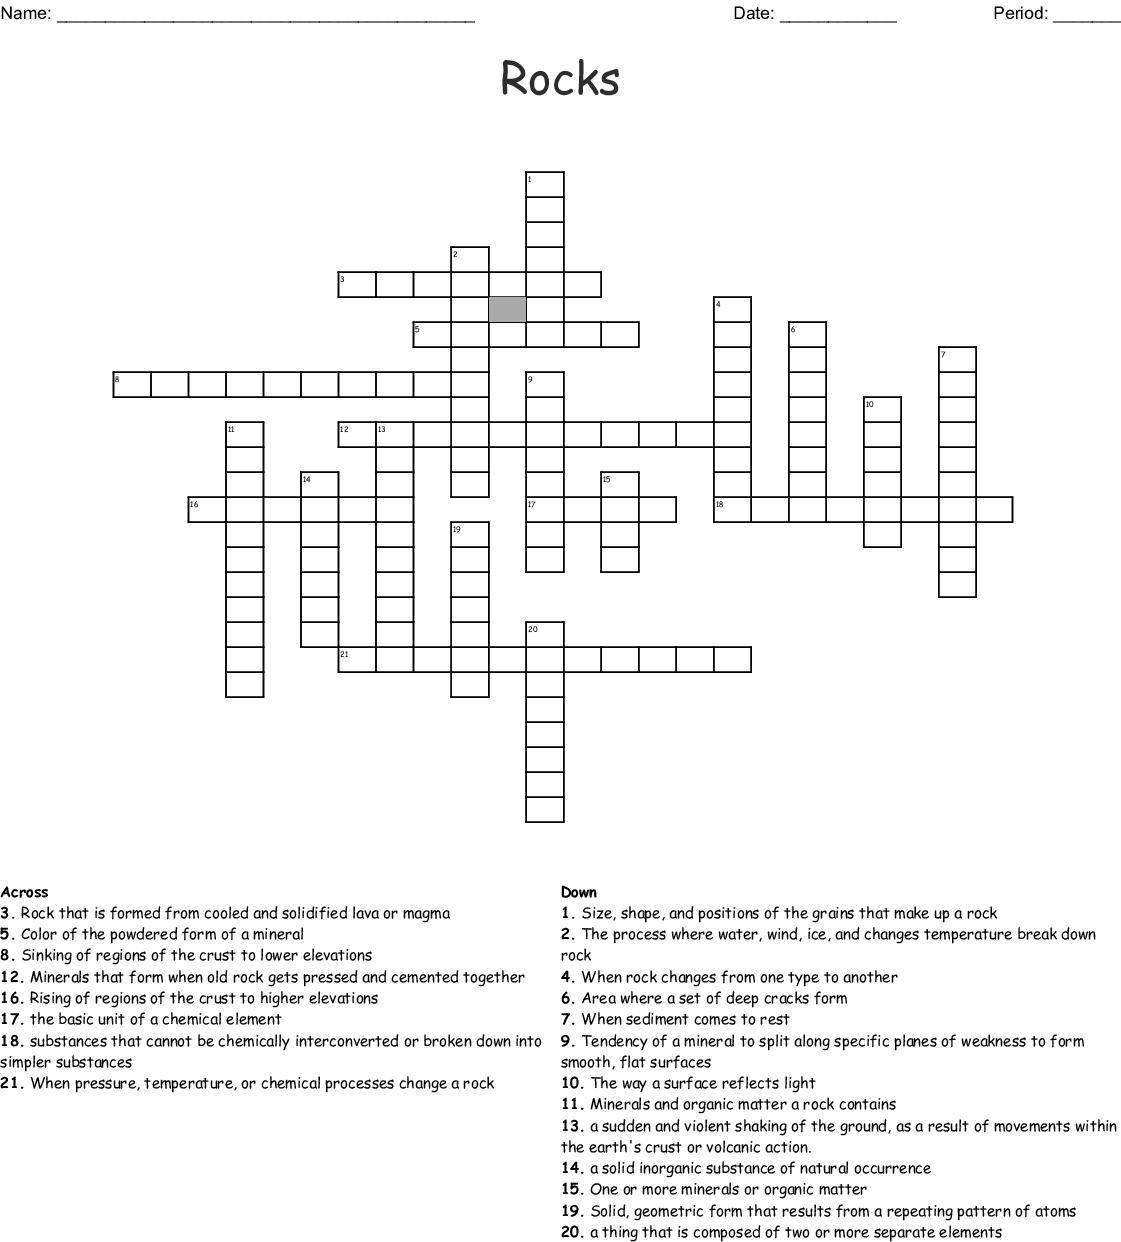 Minerals and Rocks Crossword - WordMint